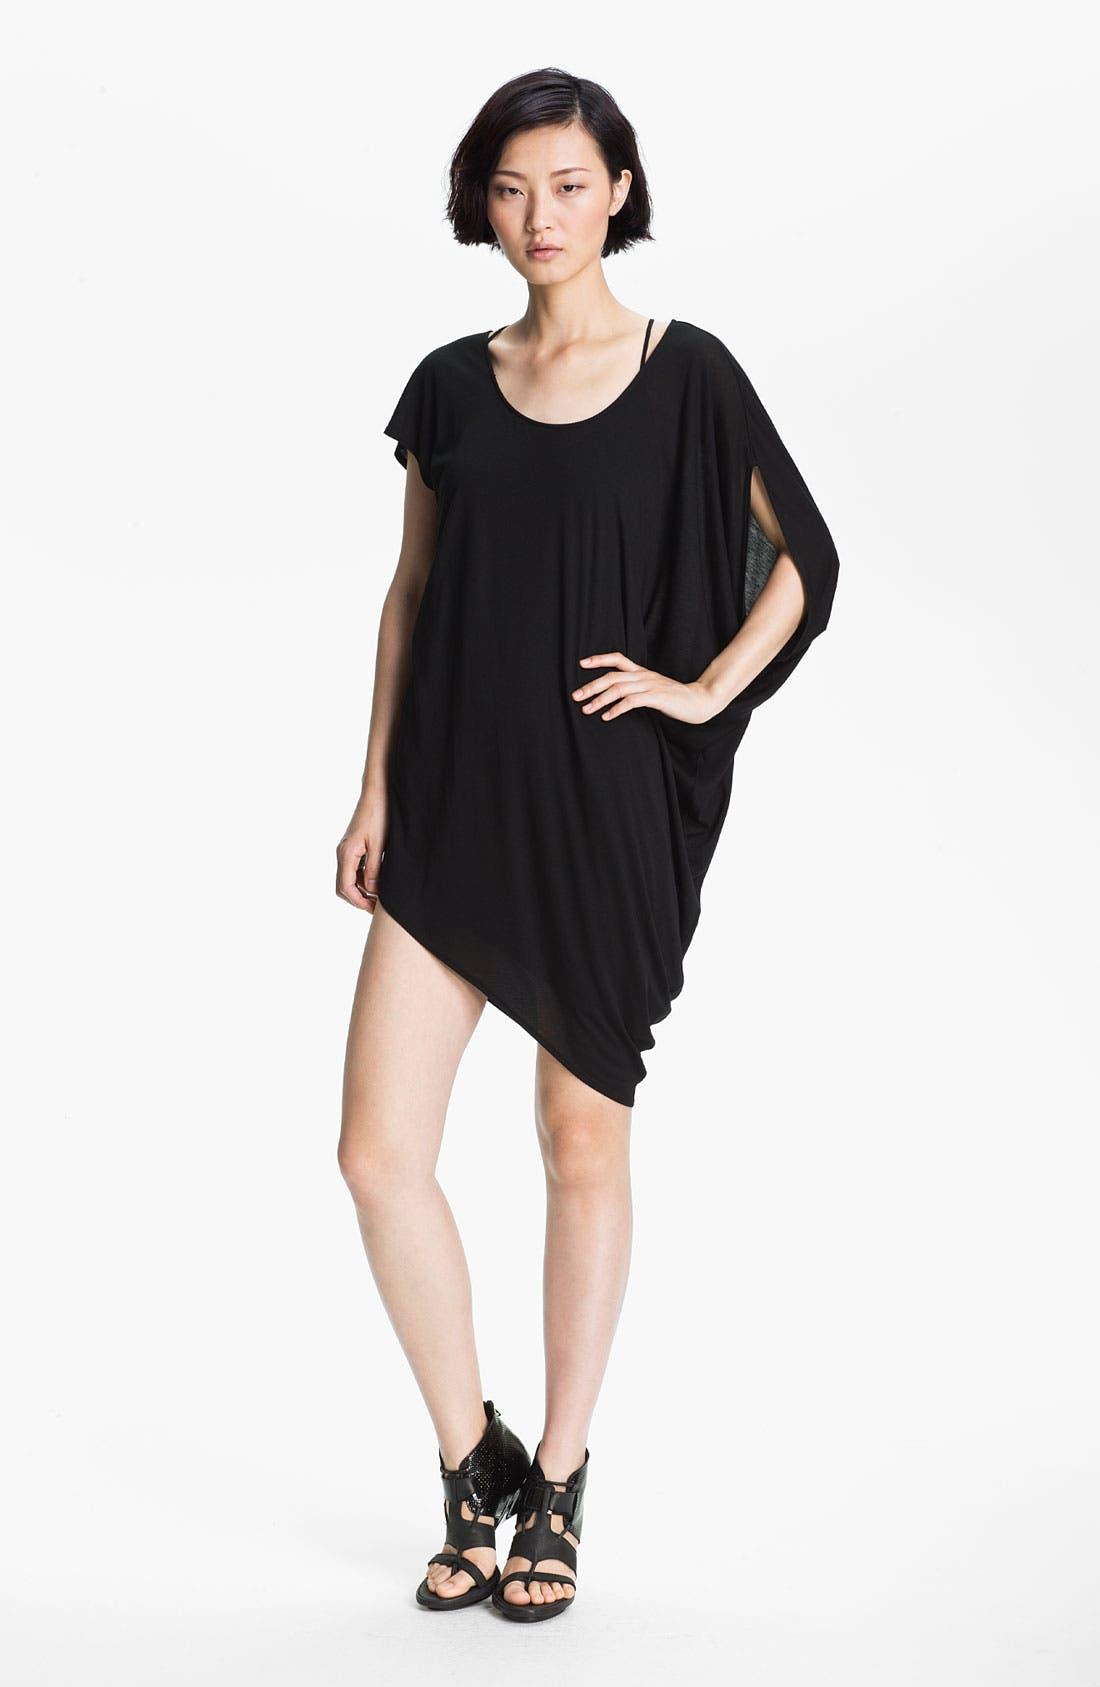 Main Image - HELMUT Helmut Lang 'Kinetic' Asymmetrical Jersey Dress